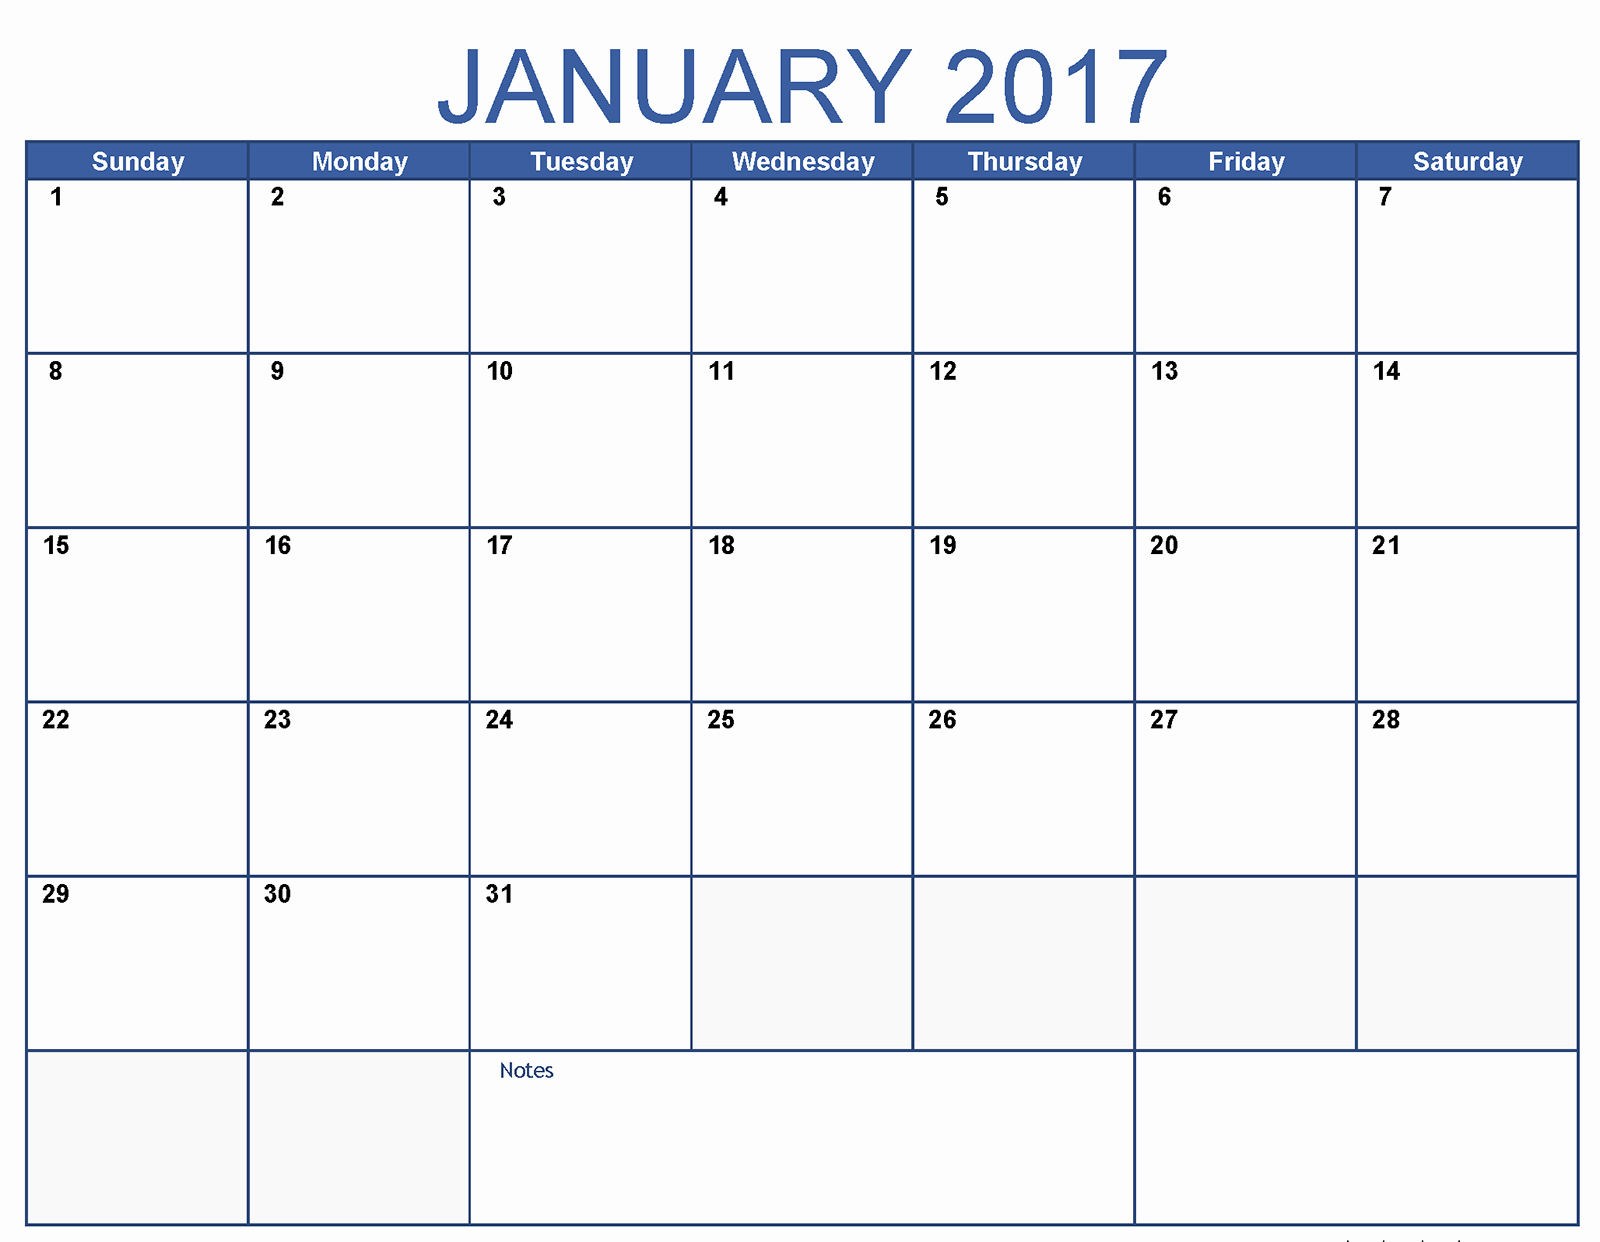 2017 Calendar Template Word Document Awesome January 2017 Word Calendar Wordcalendar